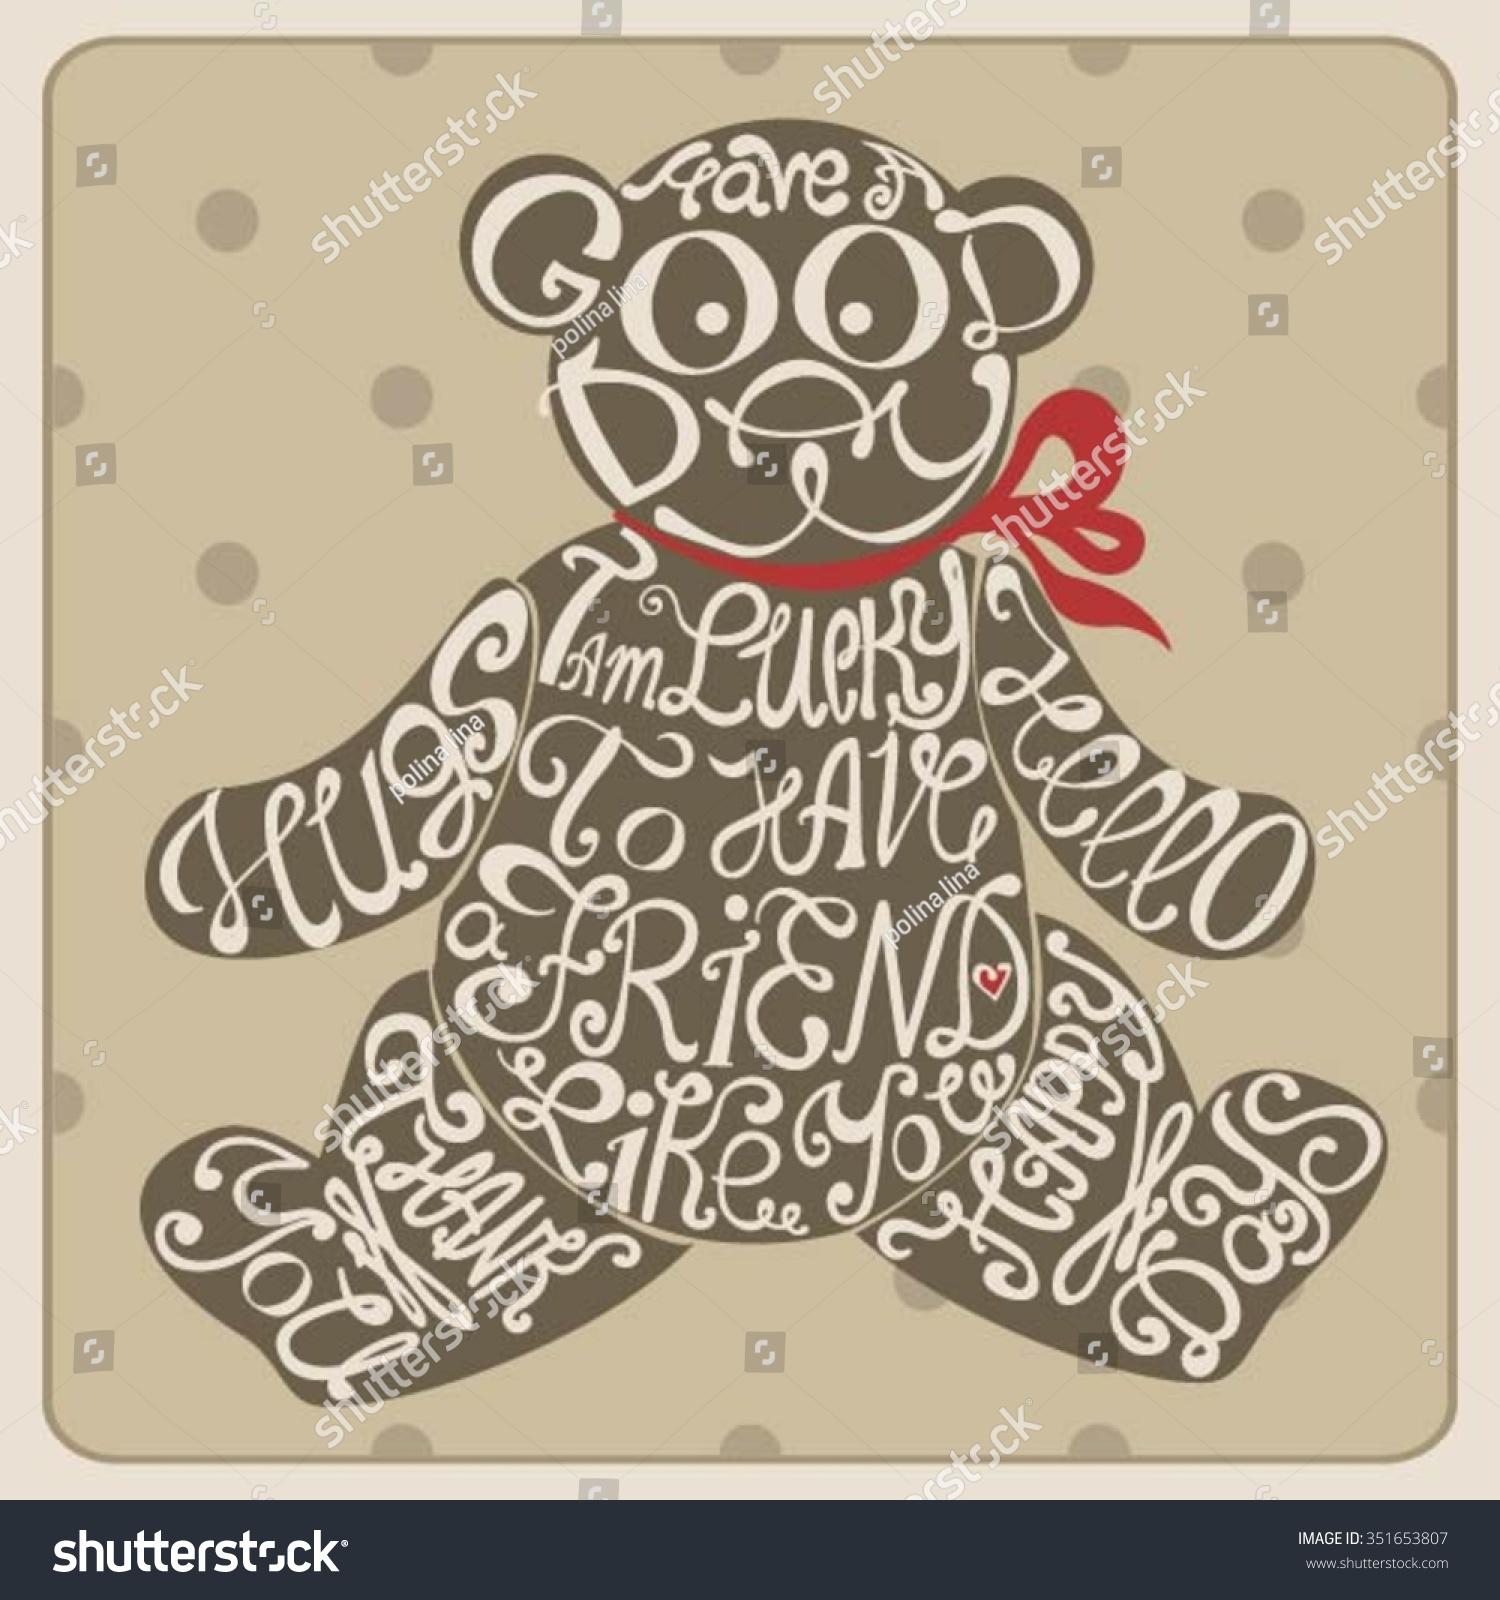 Icon Teddy Bear Made Words Inscription Stock Vector Royalty Free